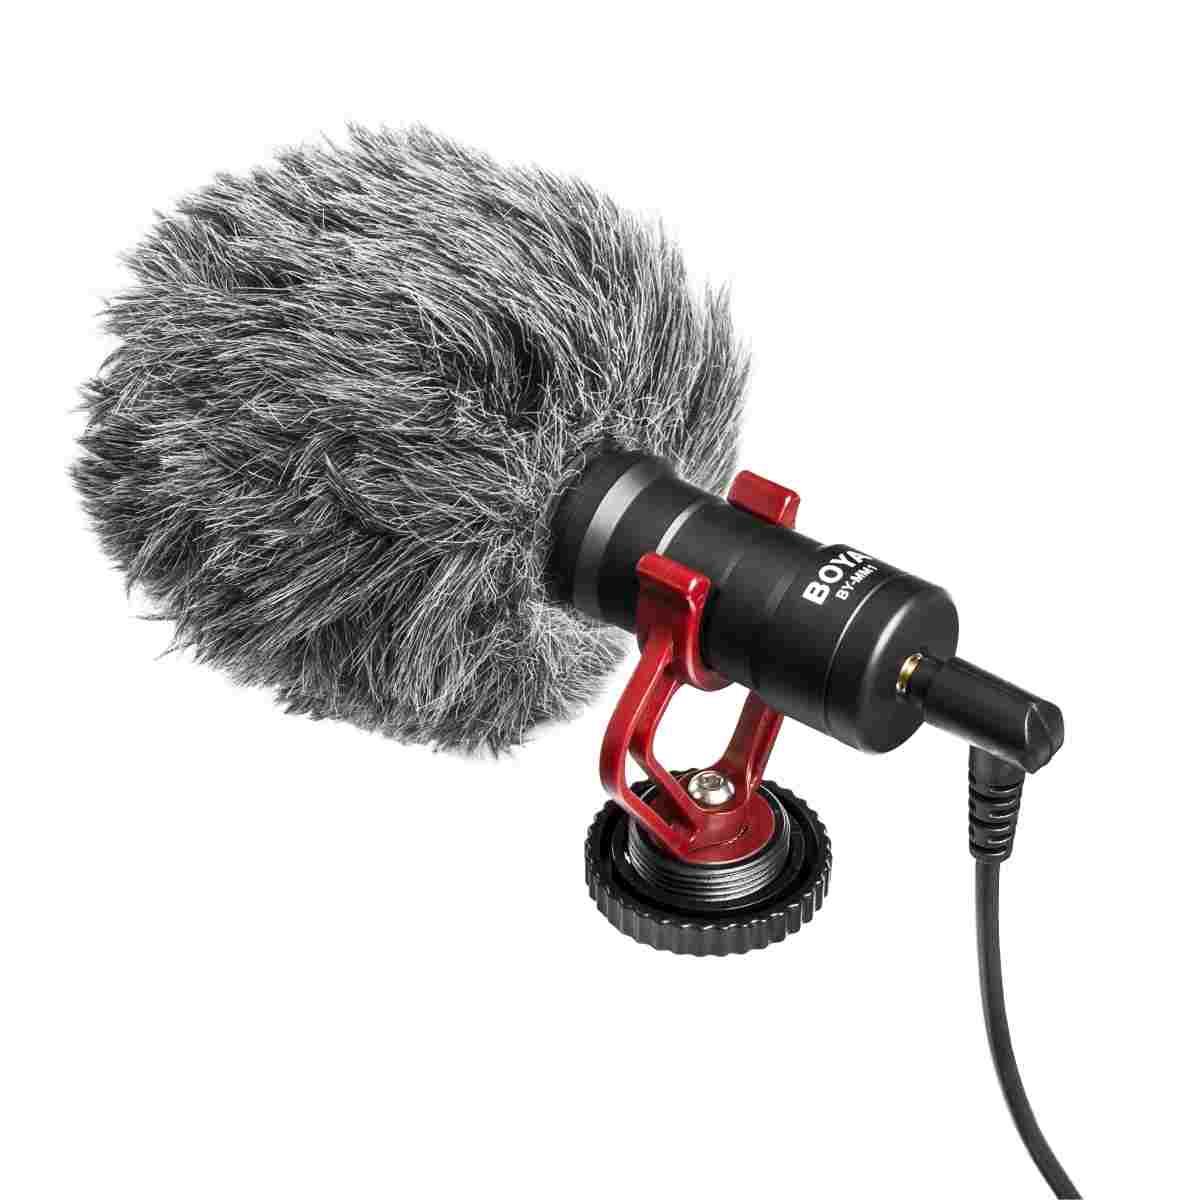 Walimex pro Boya MM1 Compact Microphone universal